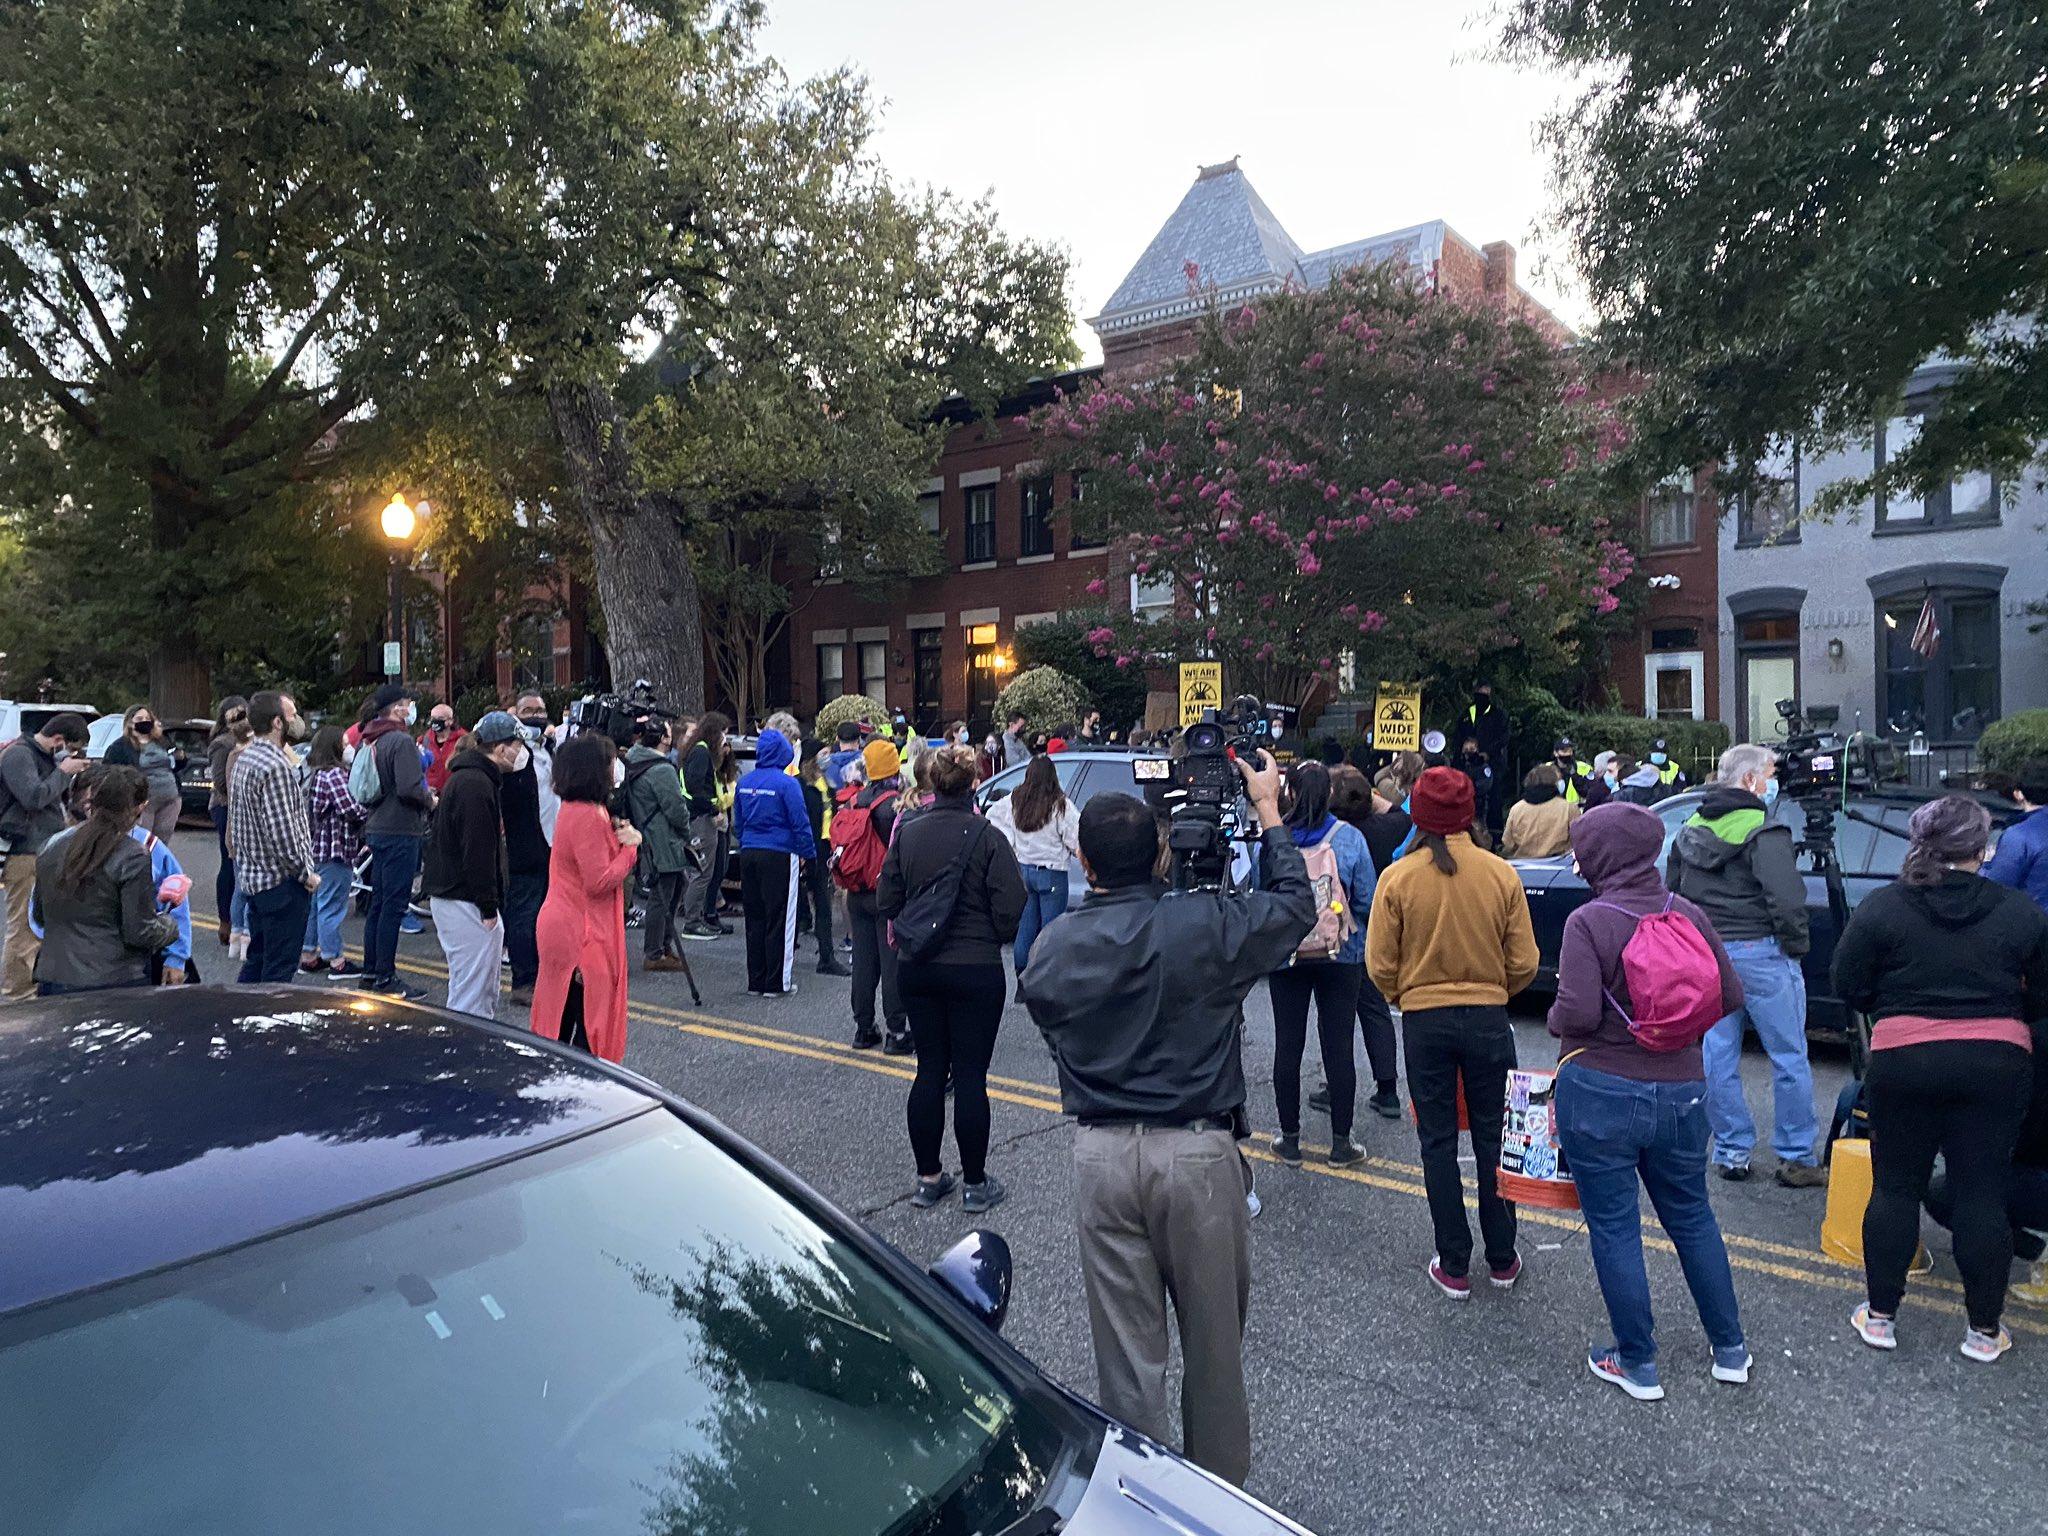 FITSNews – Washington DC Protesters Target Lindsey Graham Over Supreme Court Vote